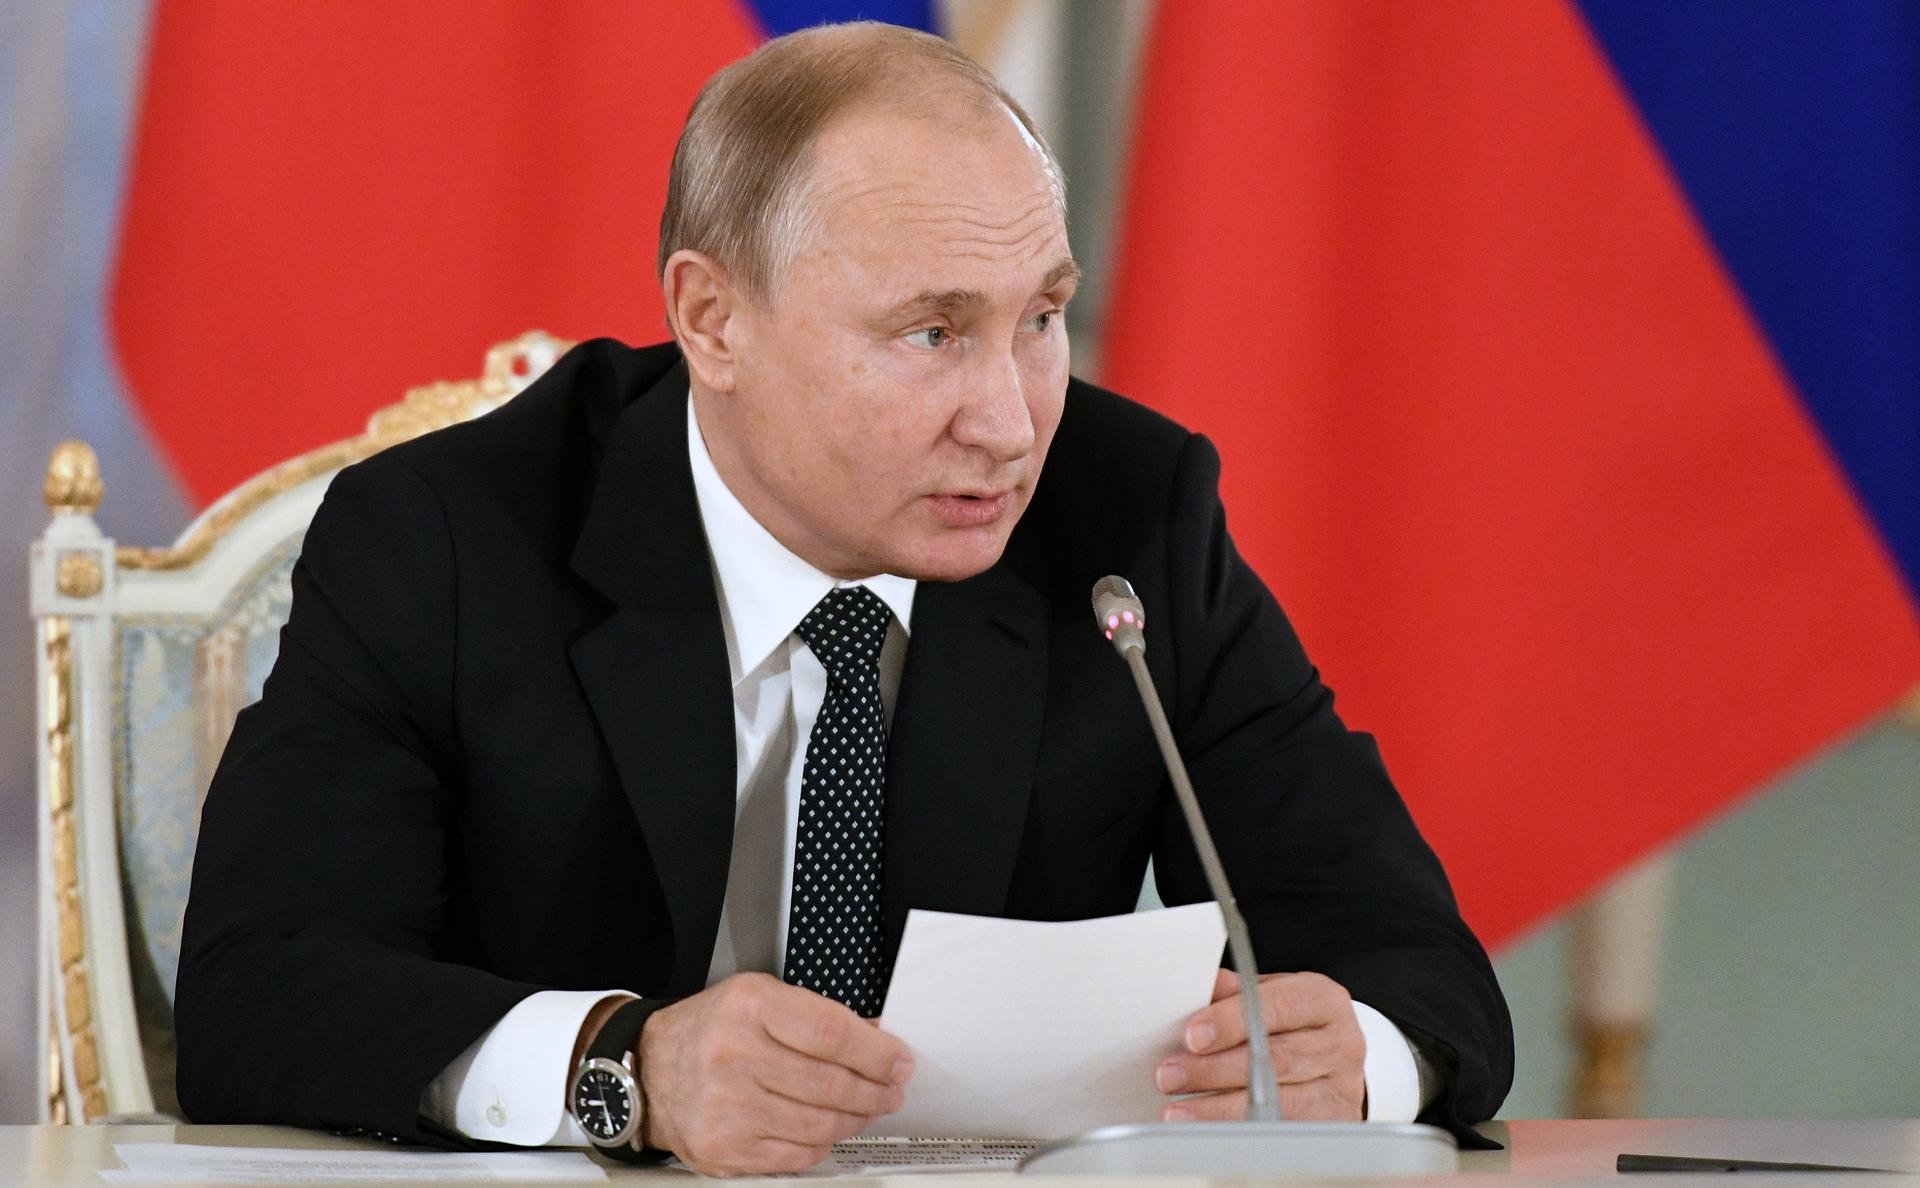 Владимир Путинна заседании Совета при президенте по культуре и искусству